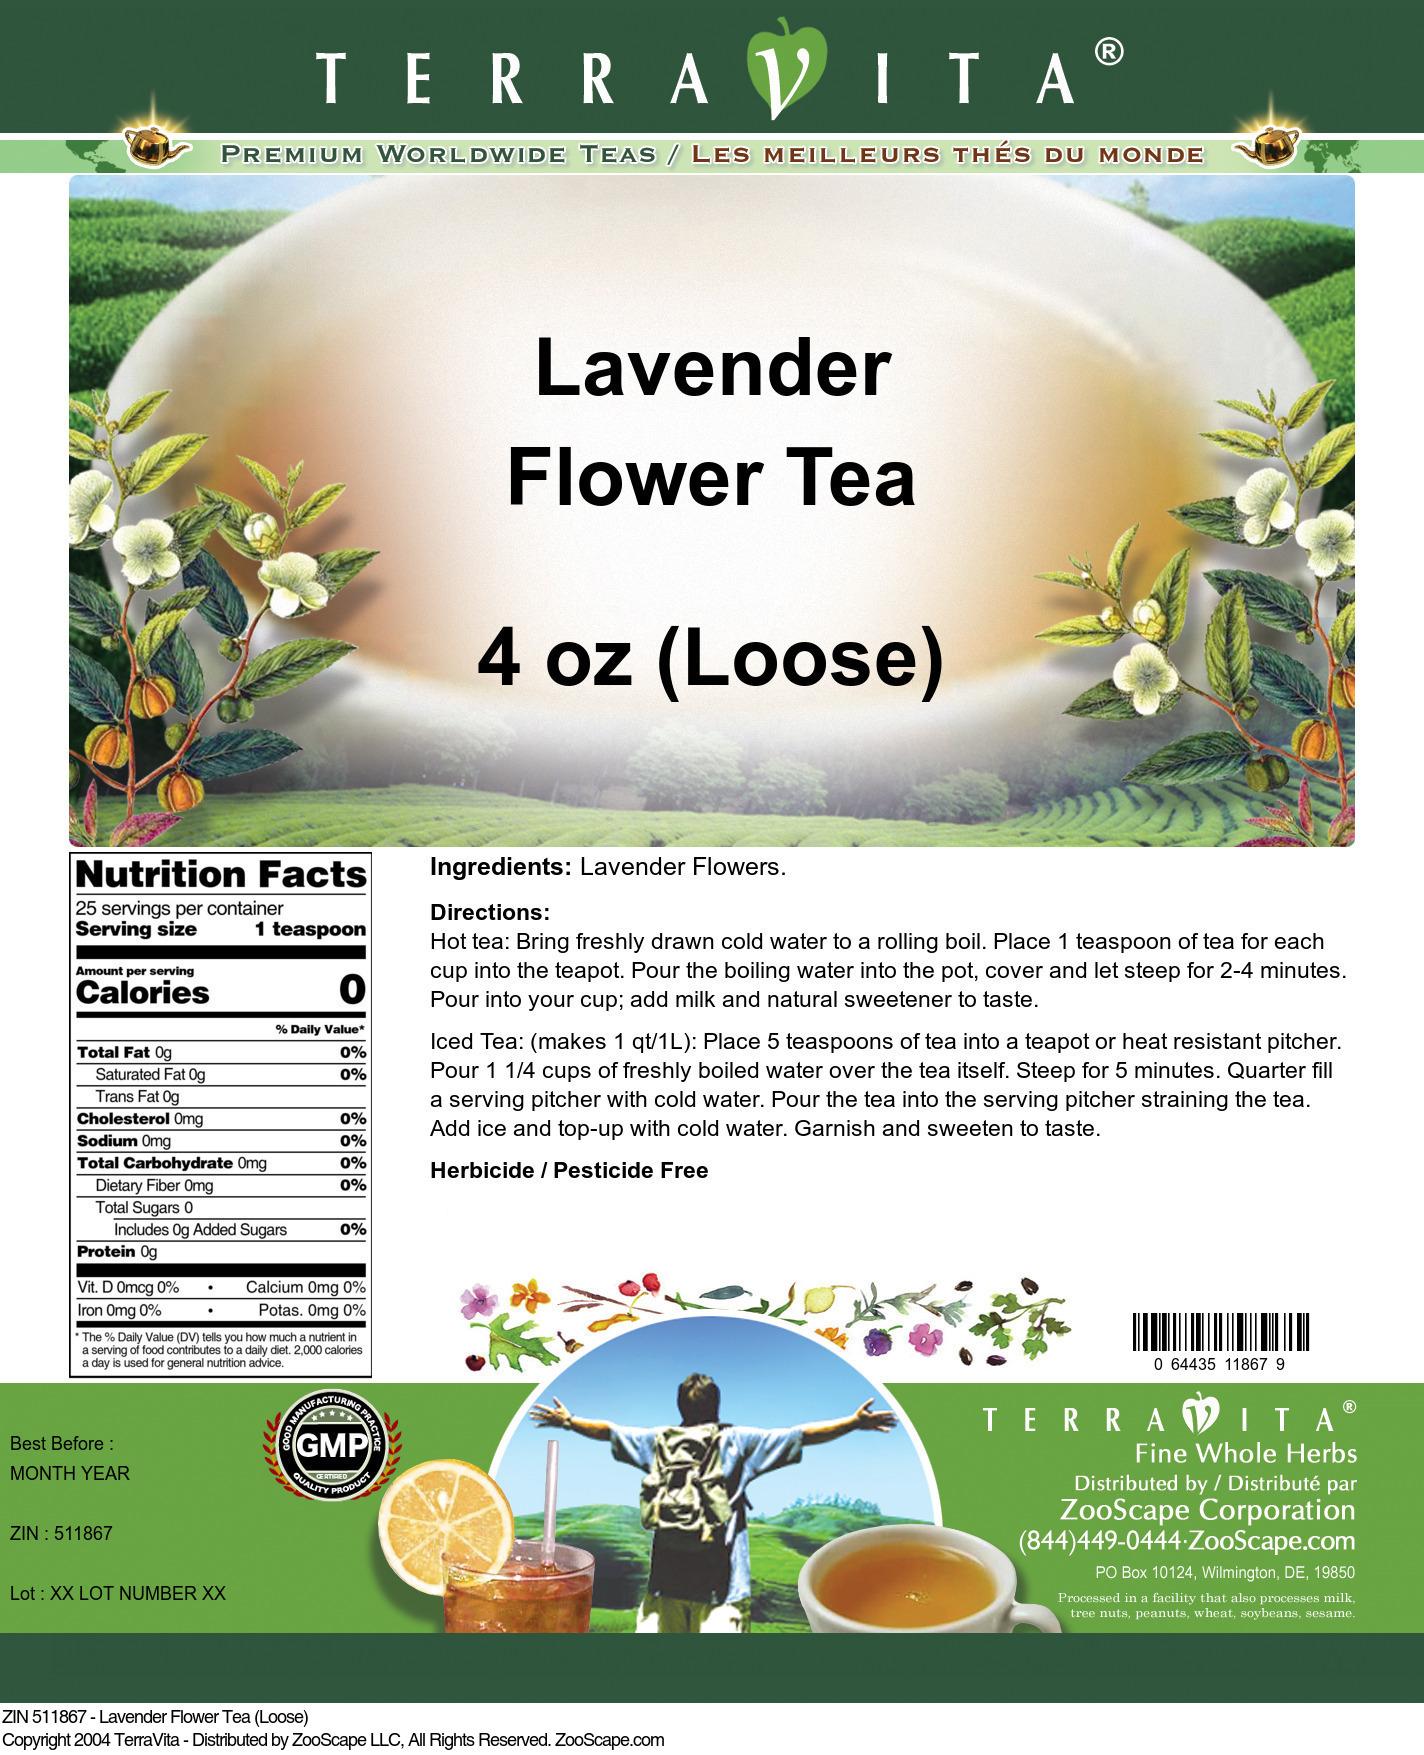 Lavender Flower Tea (Loose)